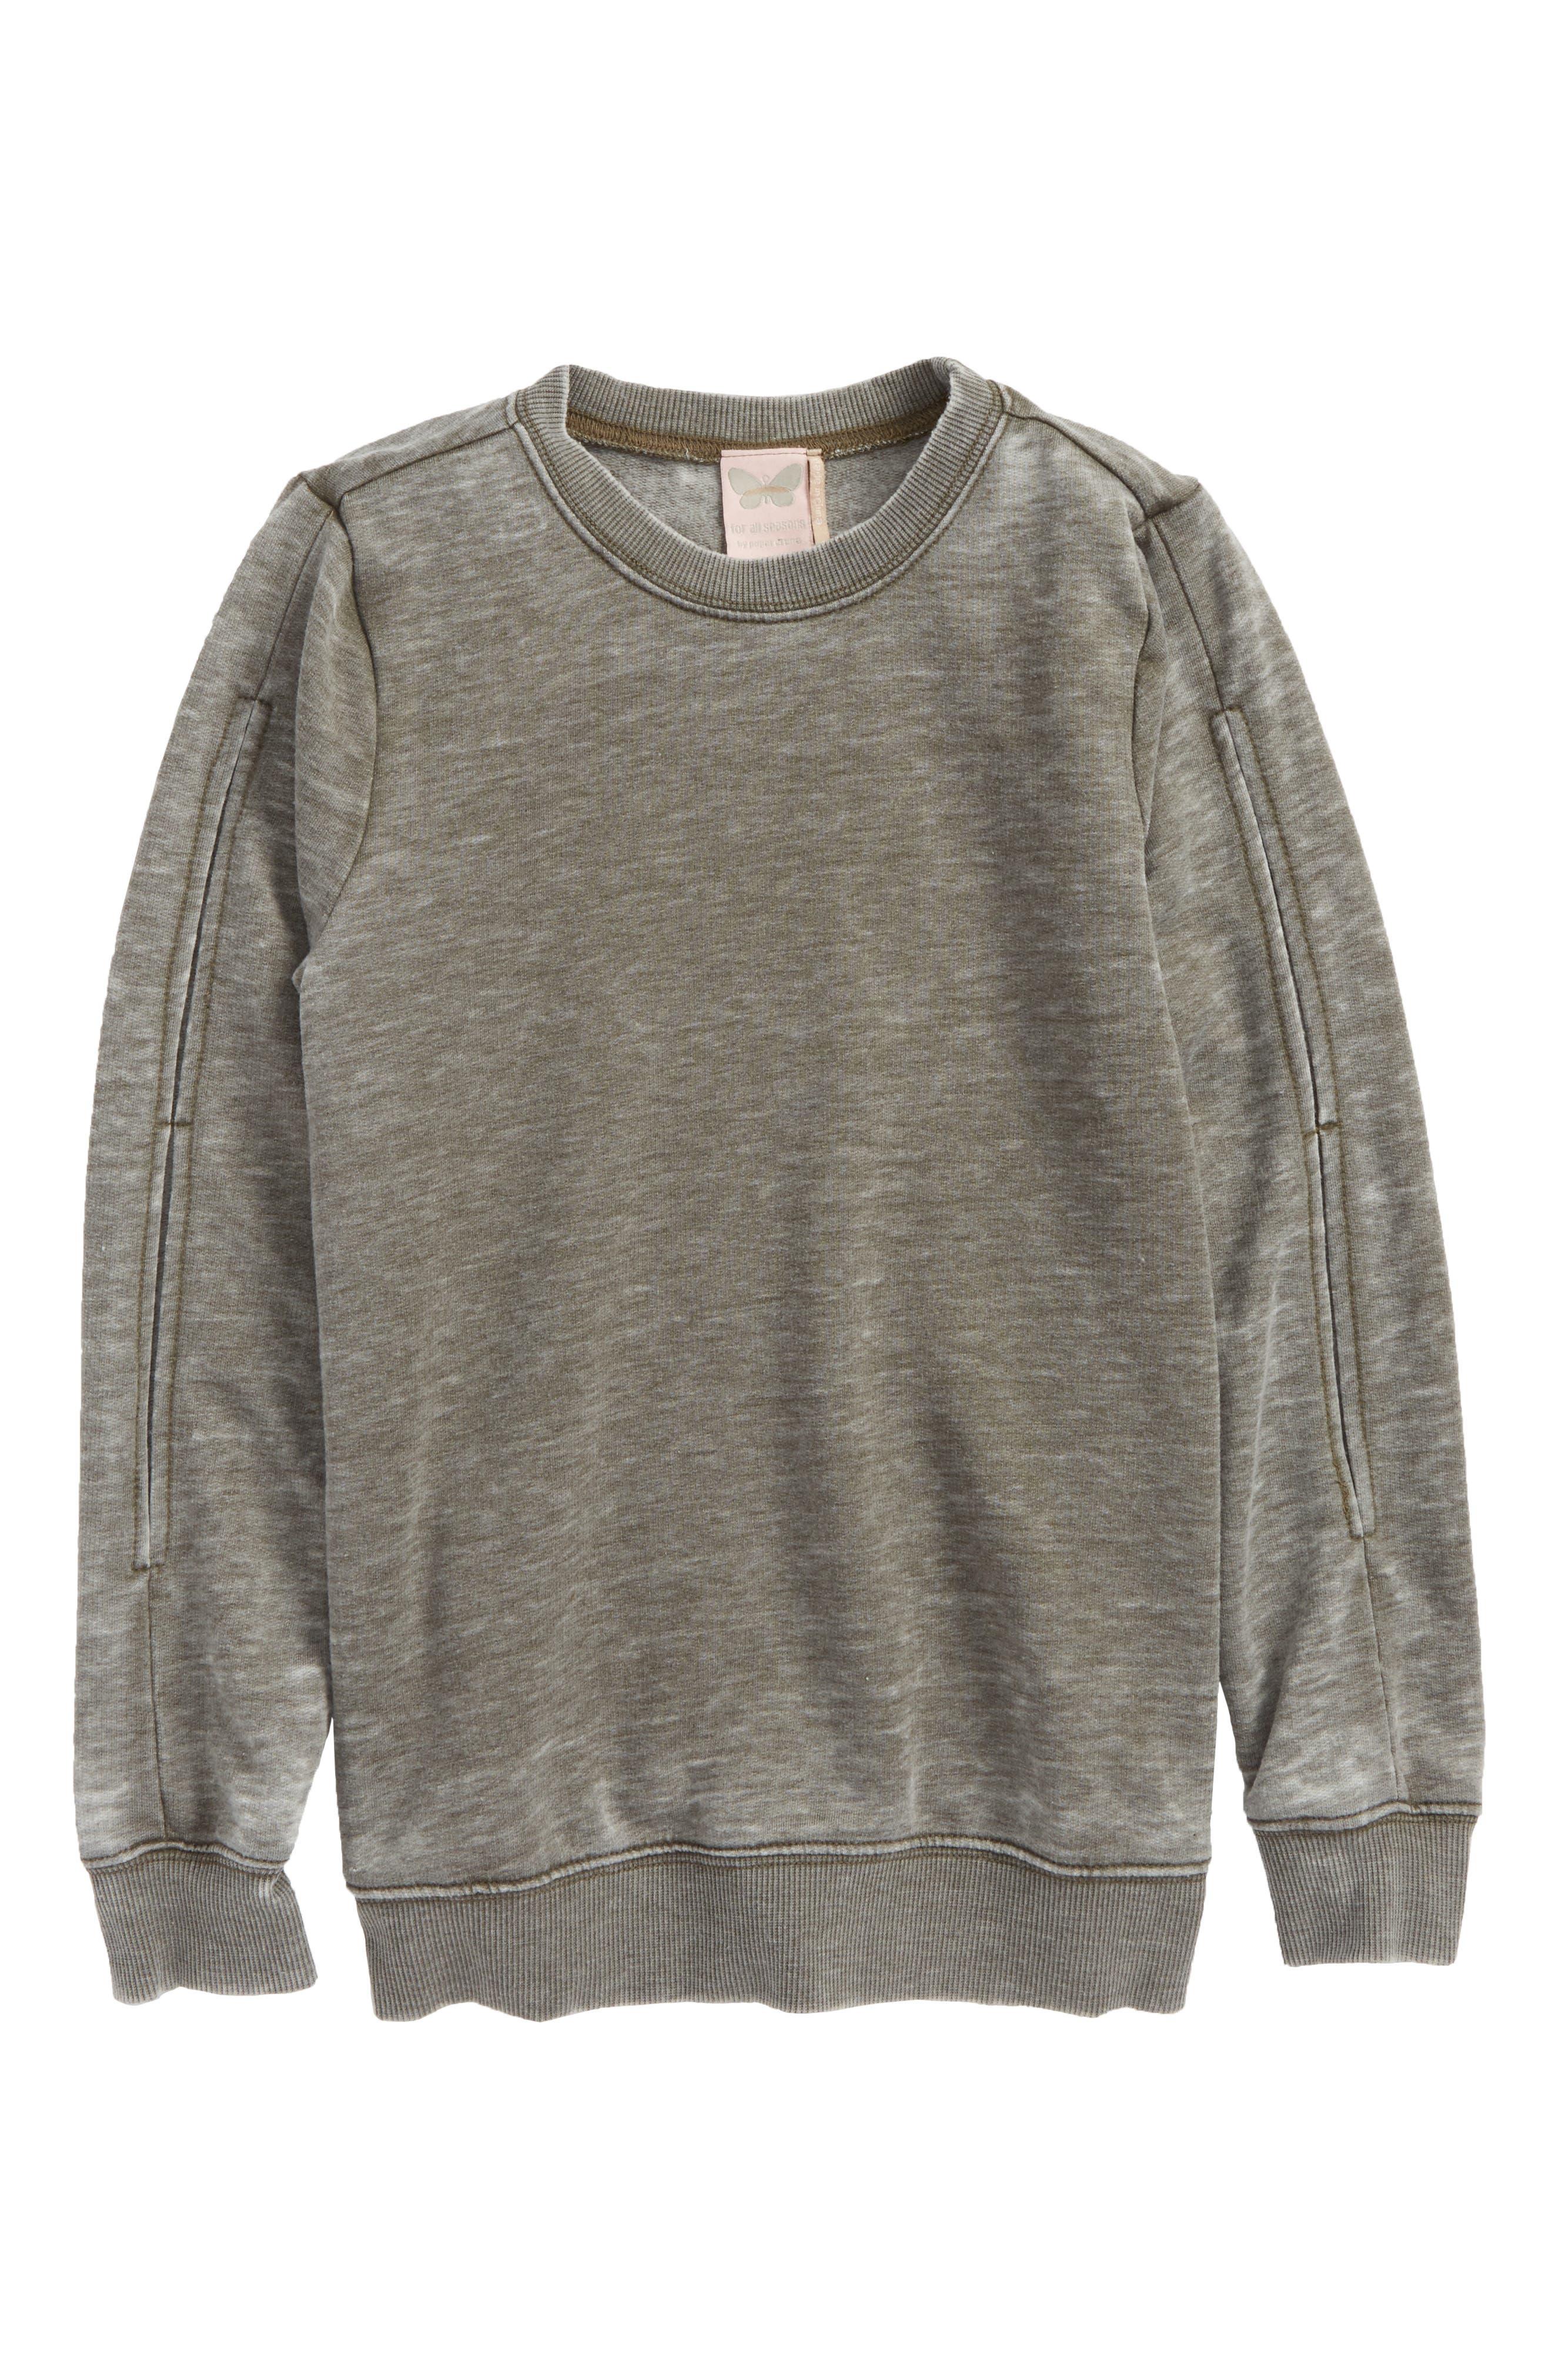 Mineral Wash Sweatshirt,                         Main,                         color, 310